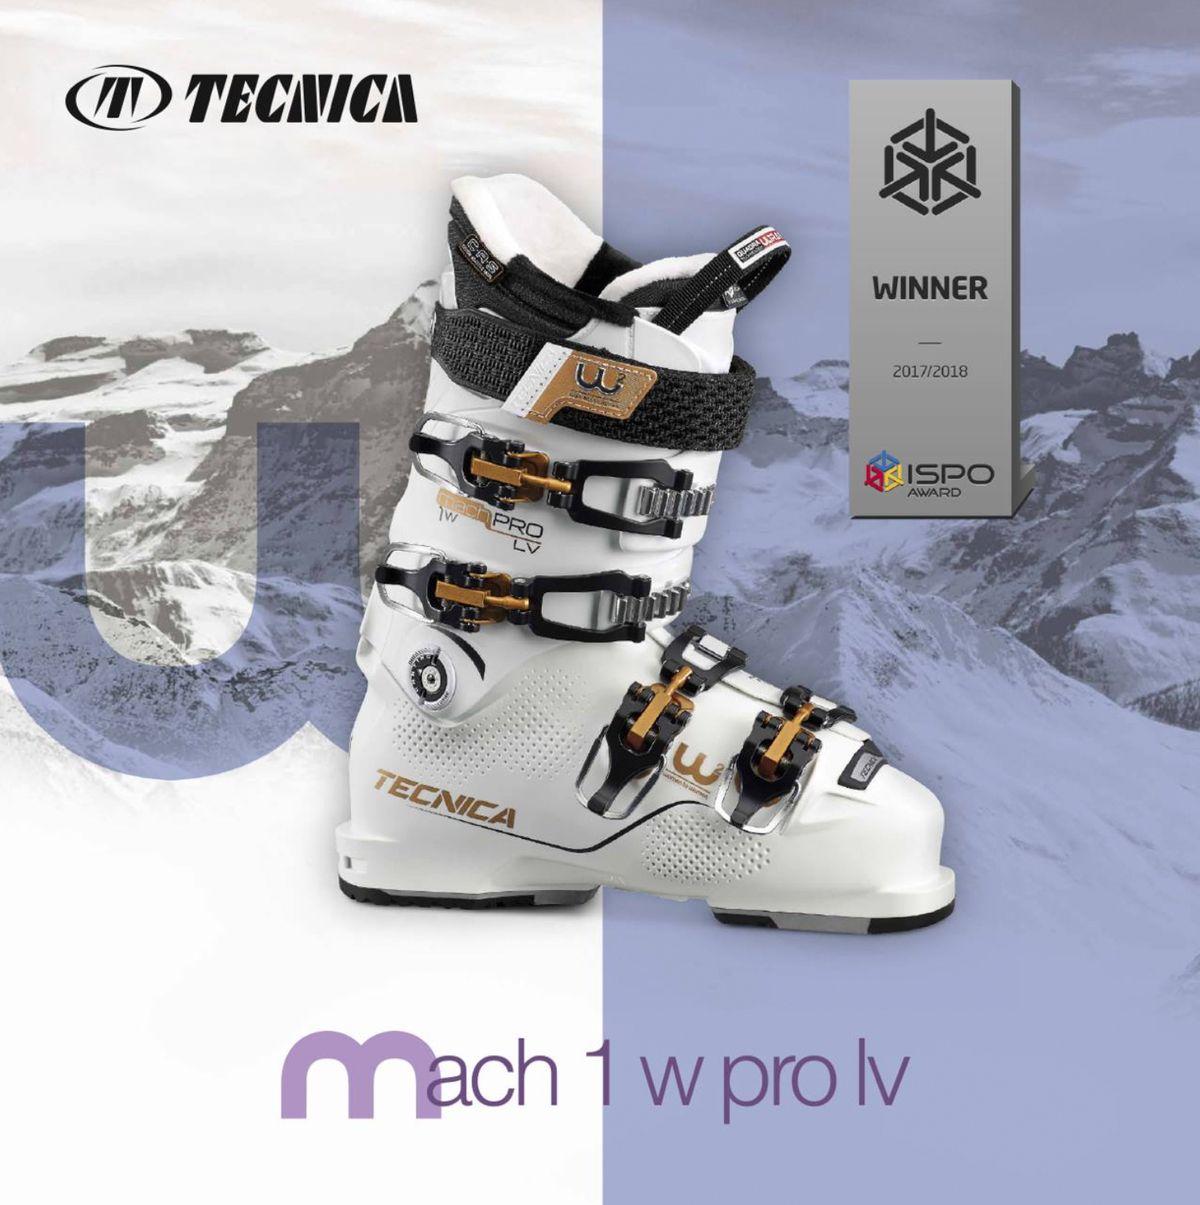 Colección Tecnica 2017/2018